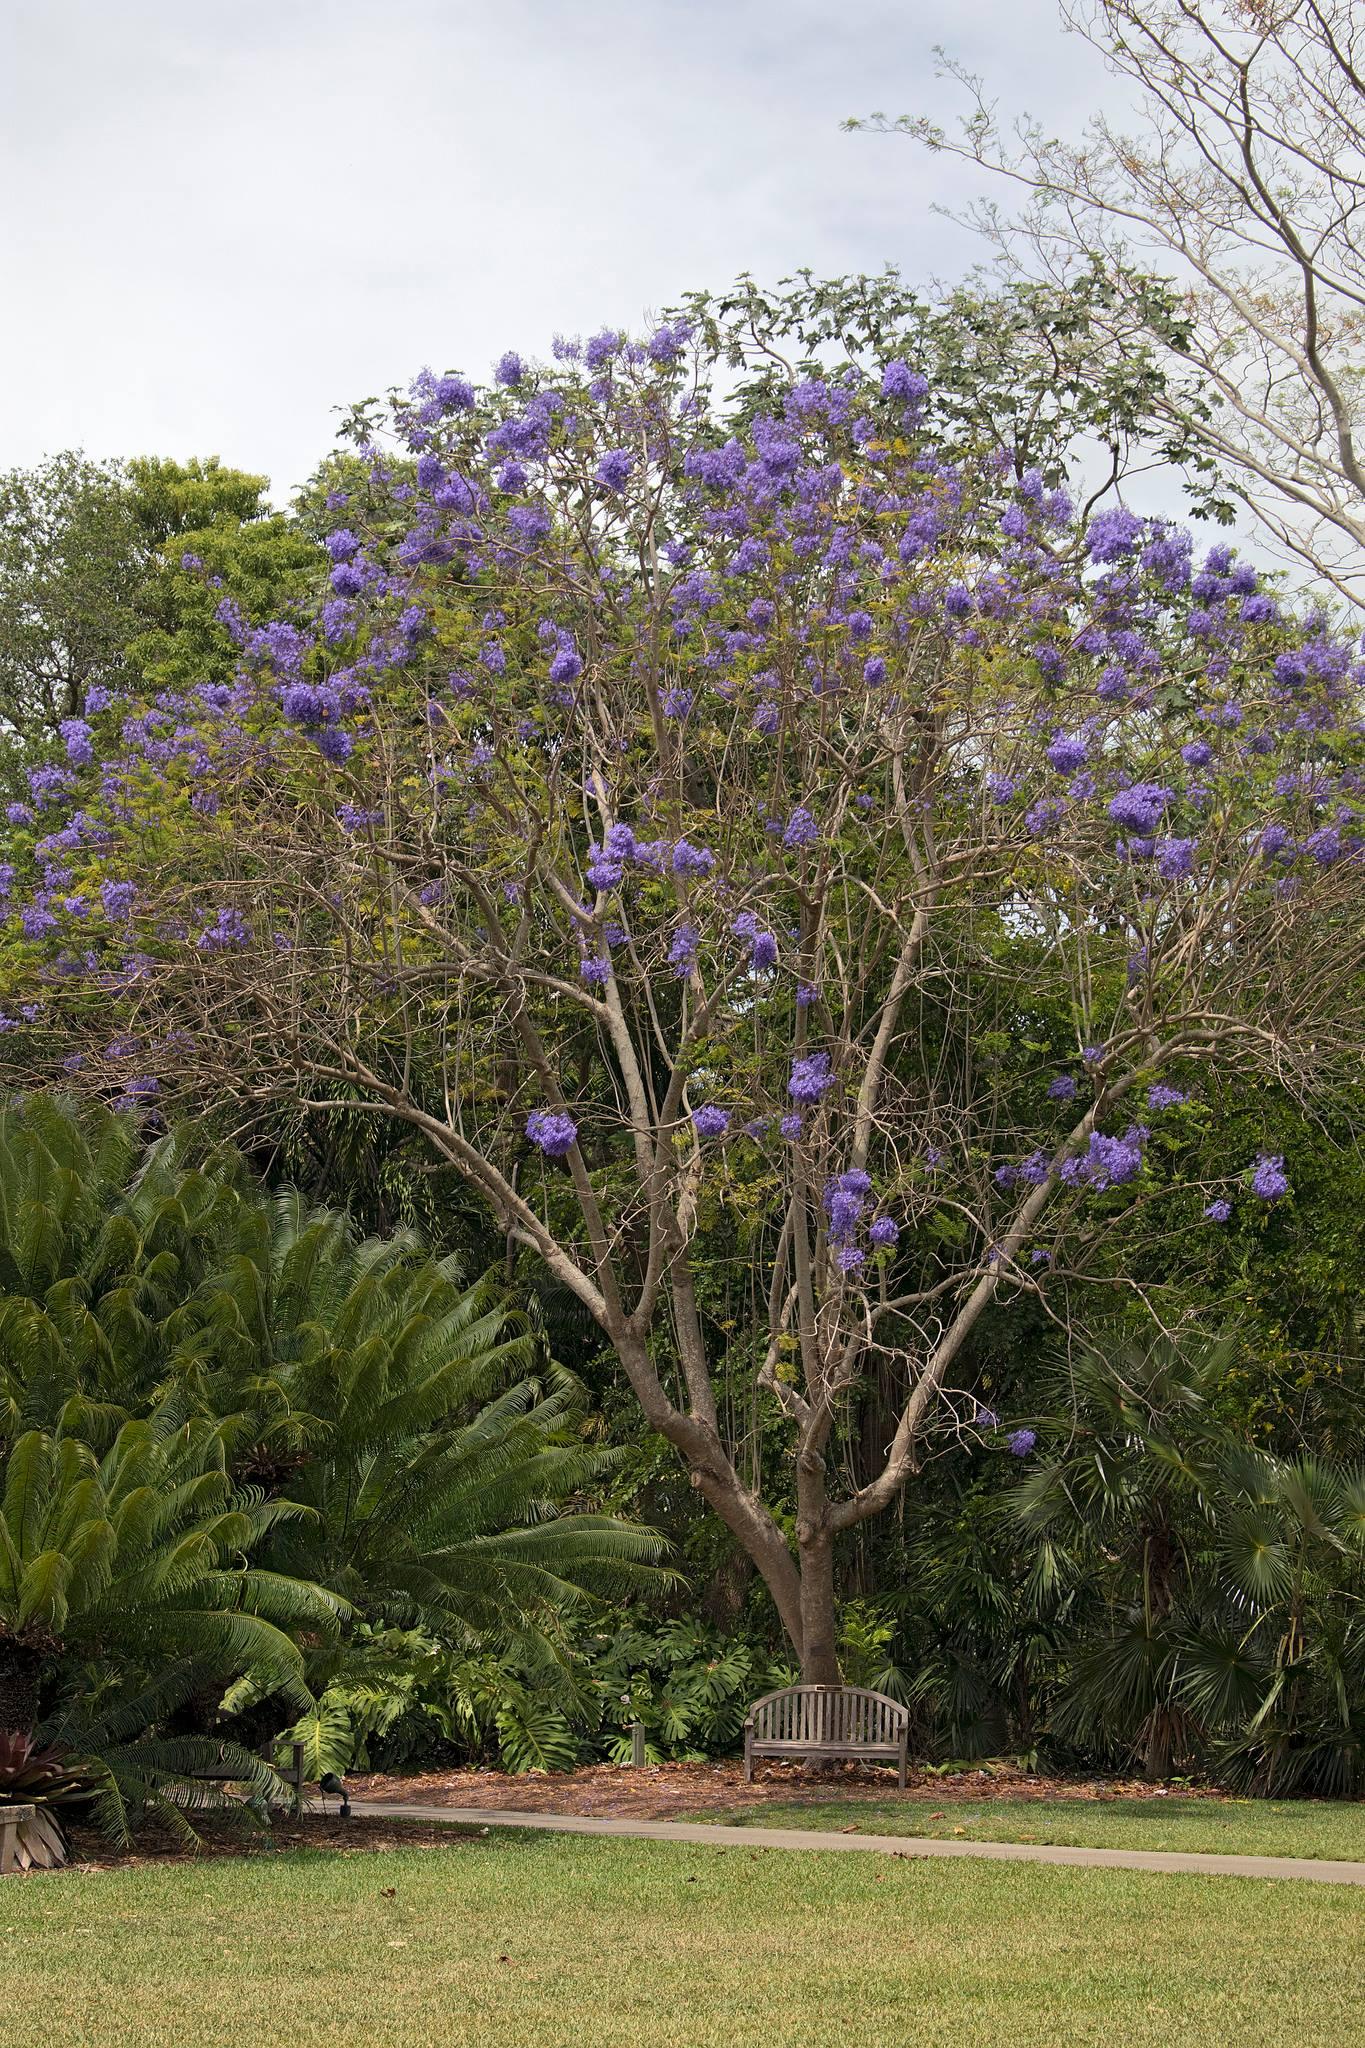 Fairchild Tropical Botanic Garden Information